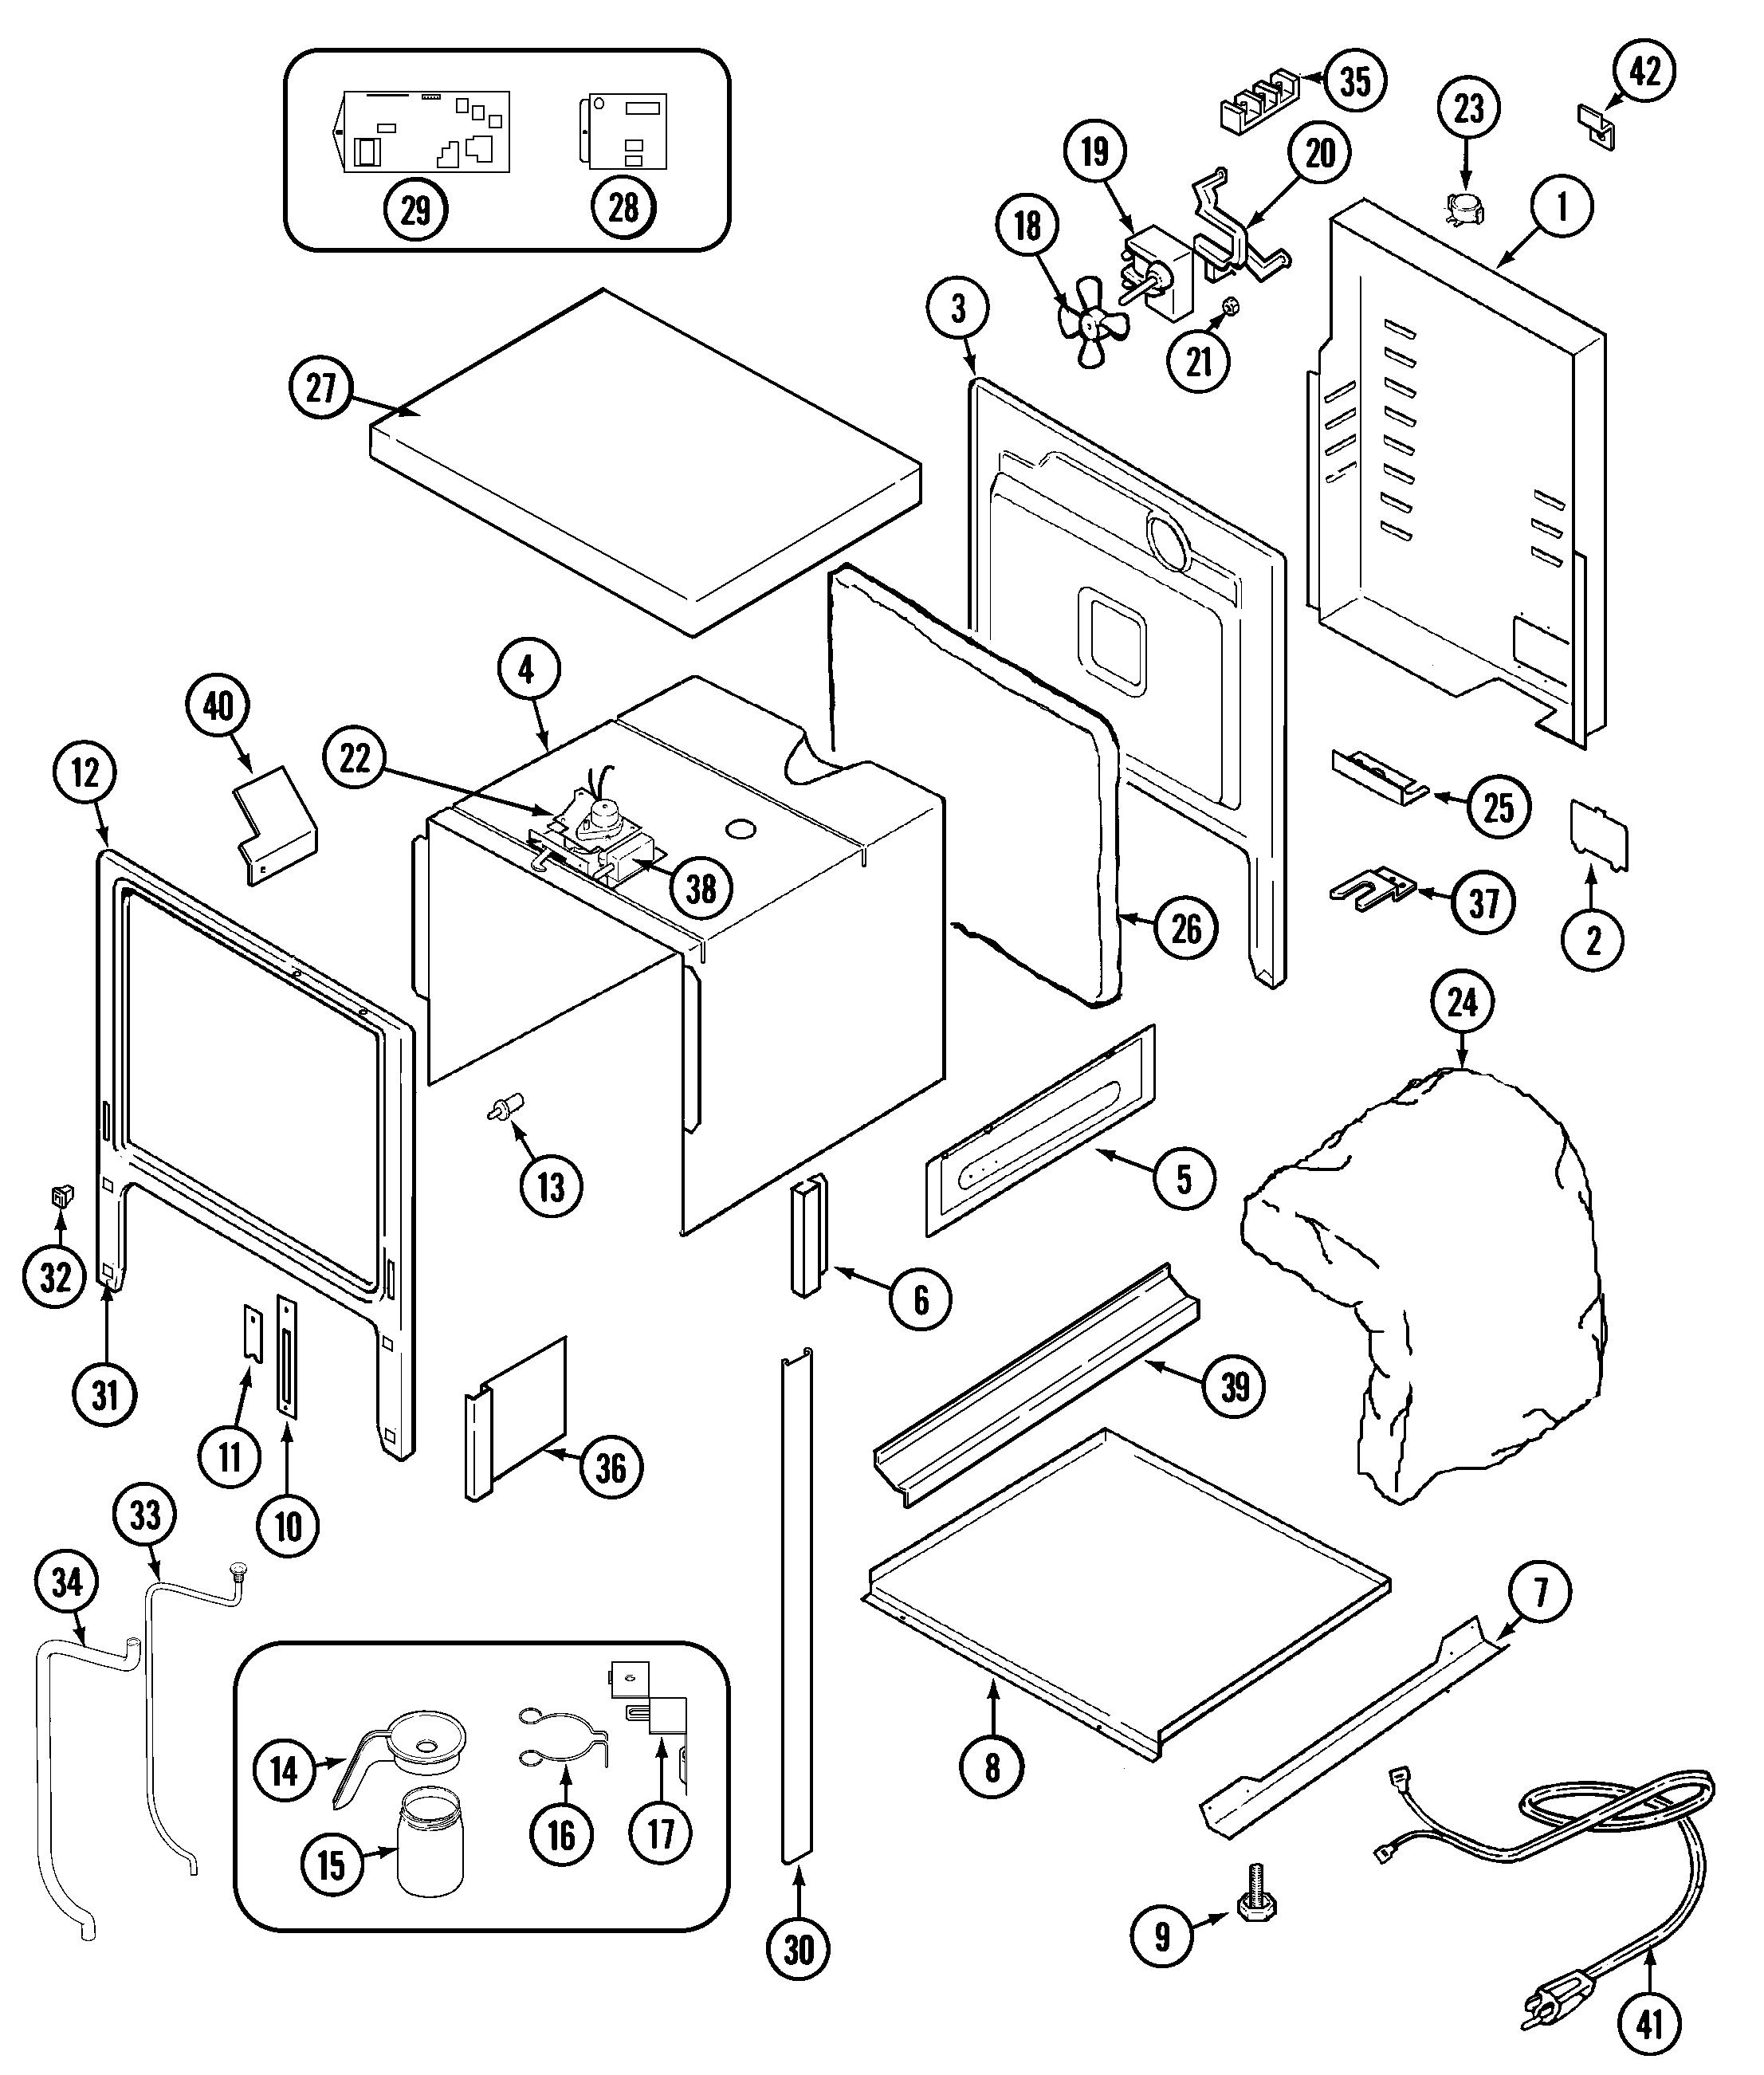 ES_9800] Jennair Electric Slidein Range Model Sve47600B Schematic WiringOtaxy Wigeg Mohammedshrine Librar Wiring 101